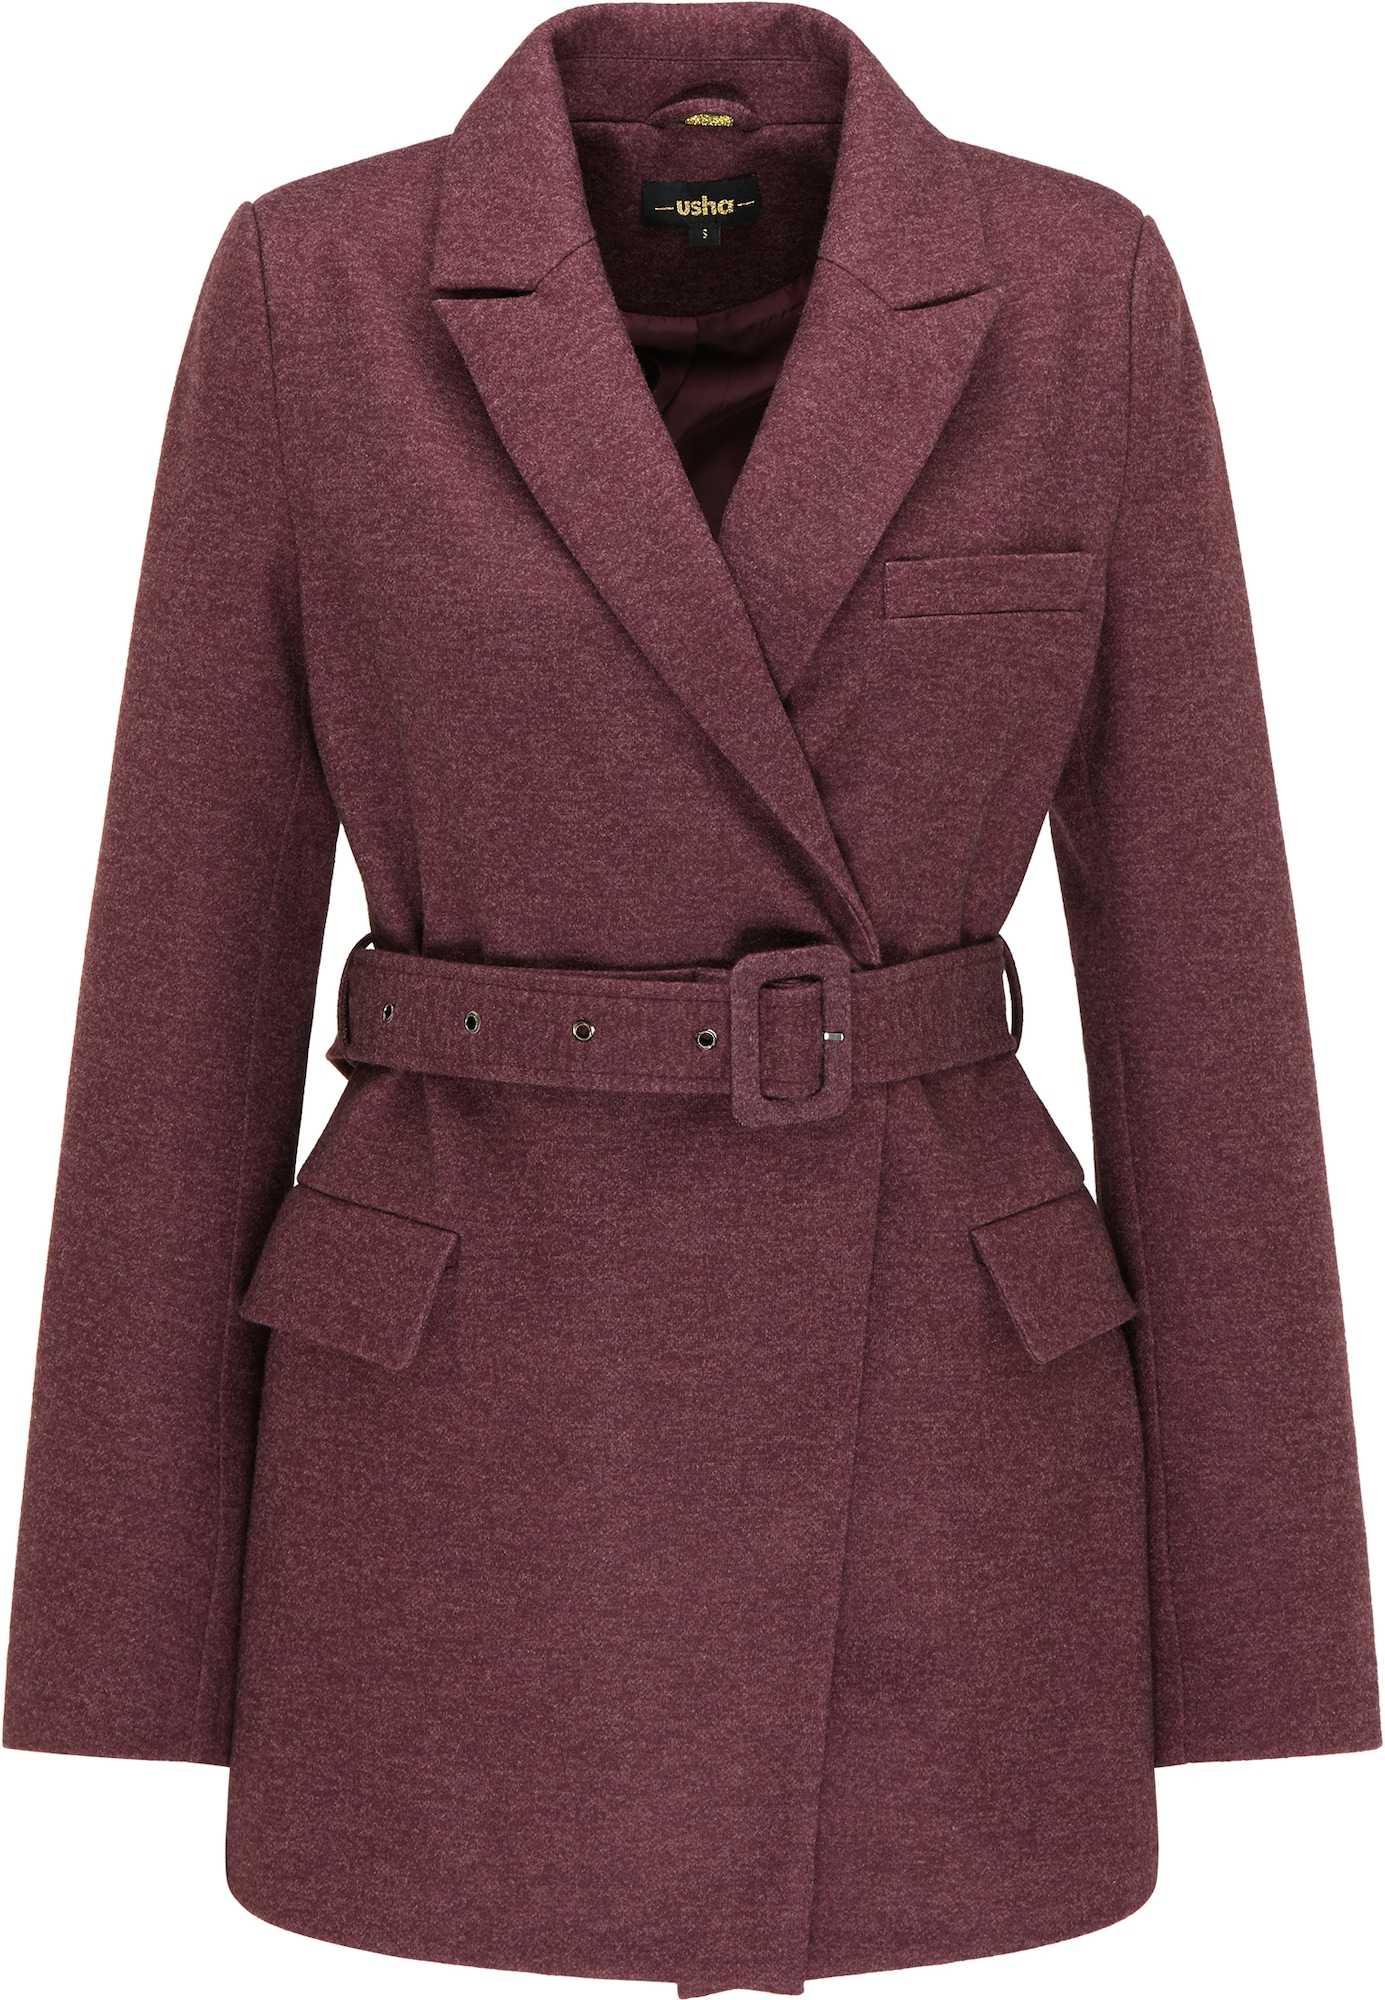 usha BLACK LABEL Demisezoninis paltas purpurinė spalva